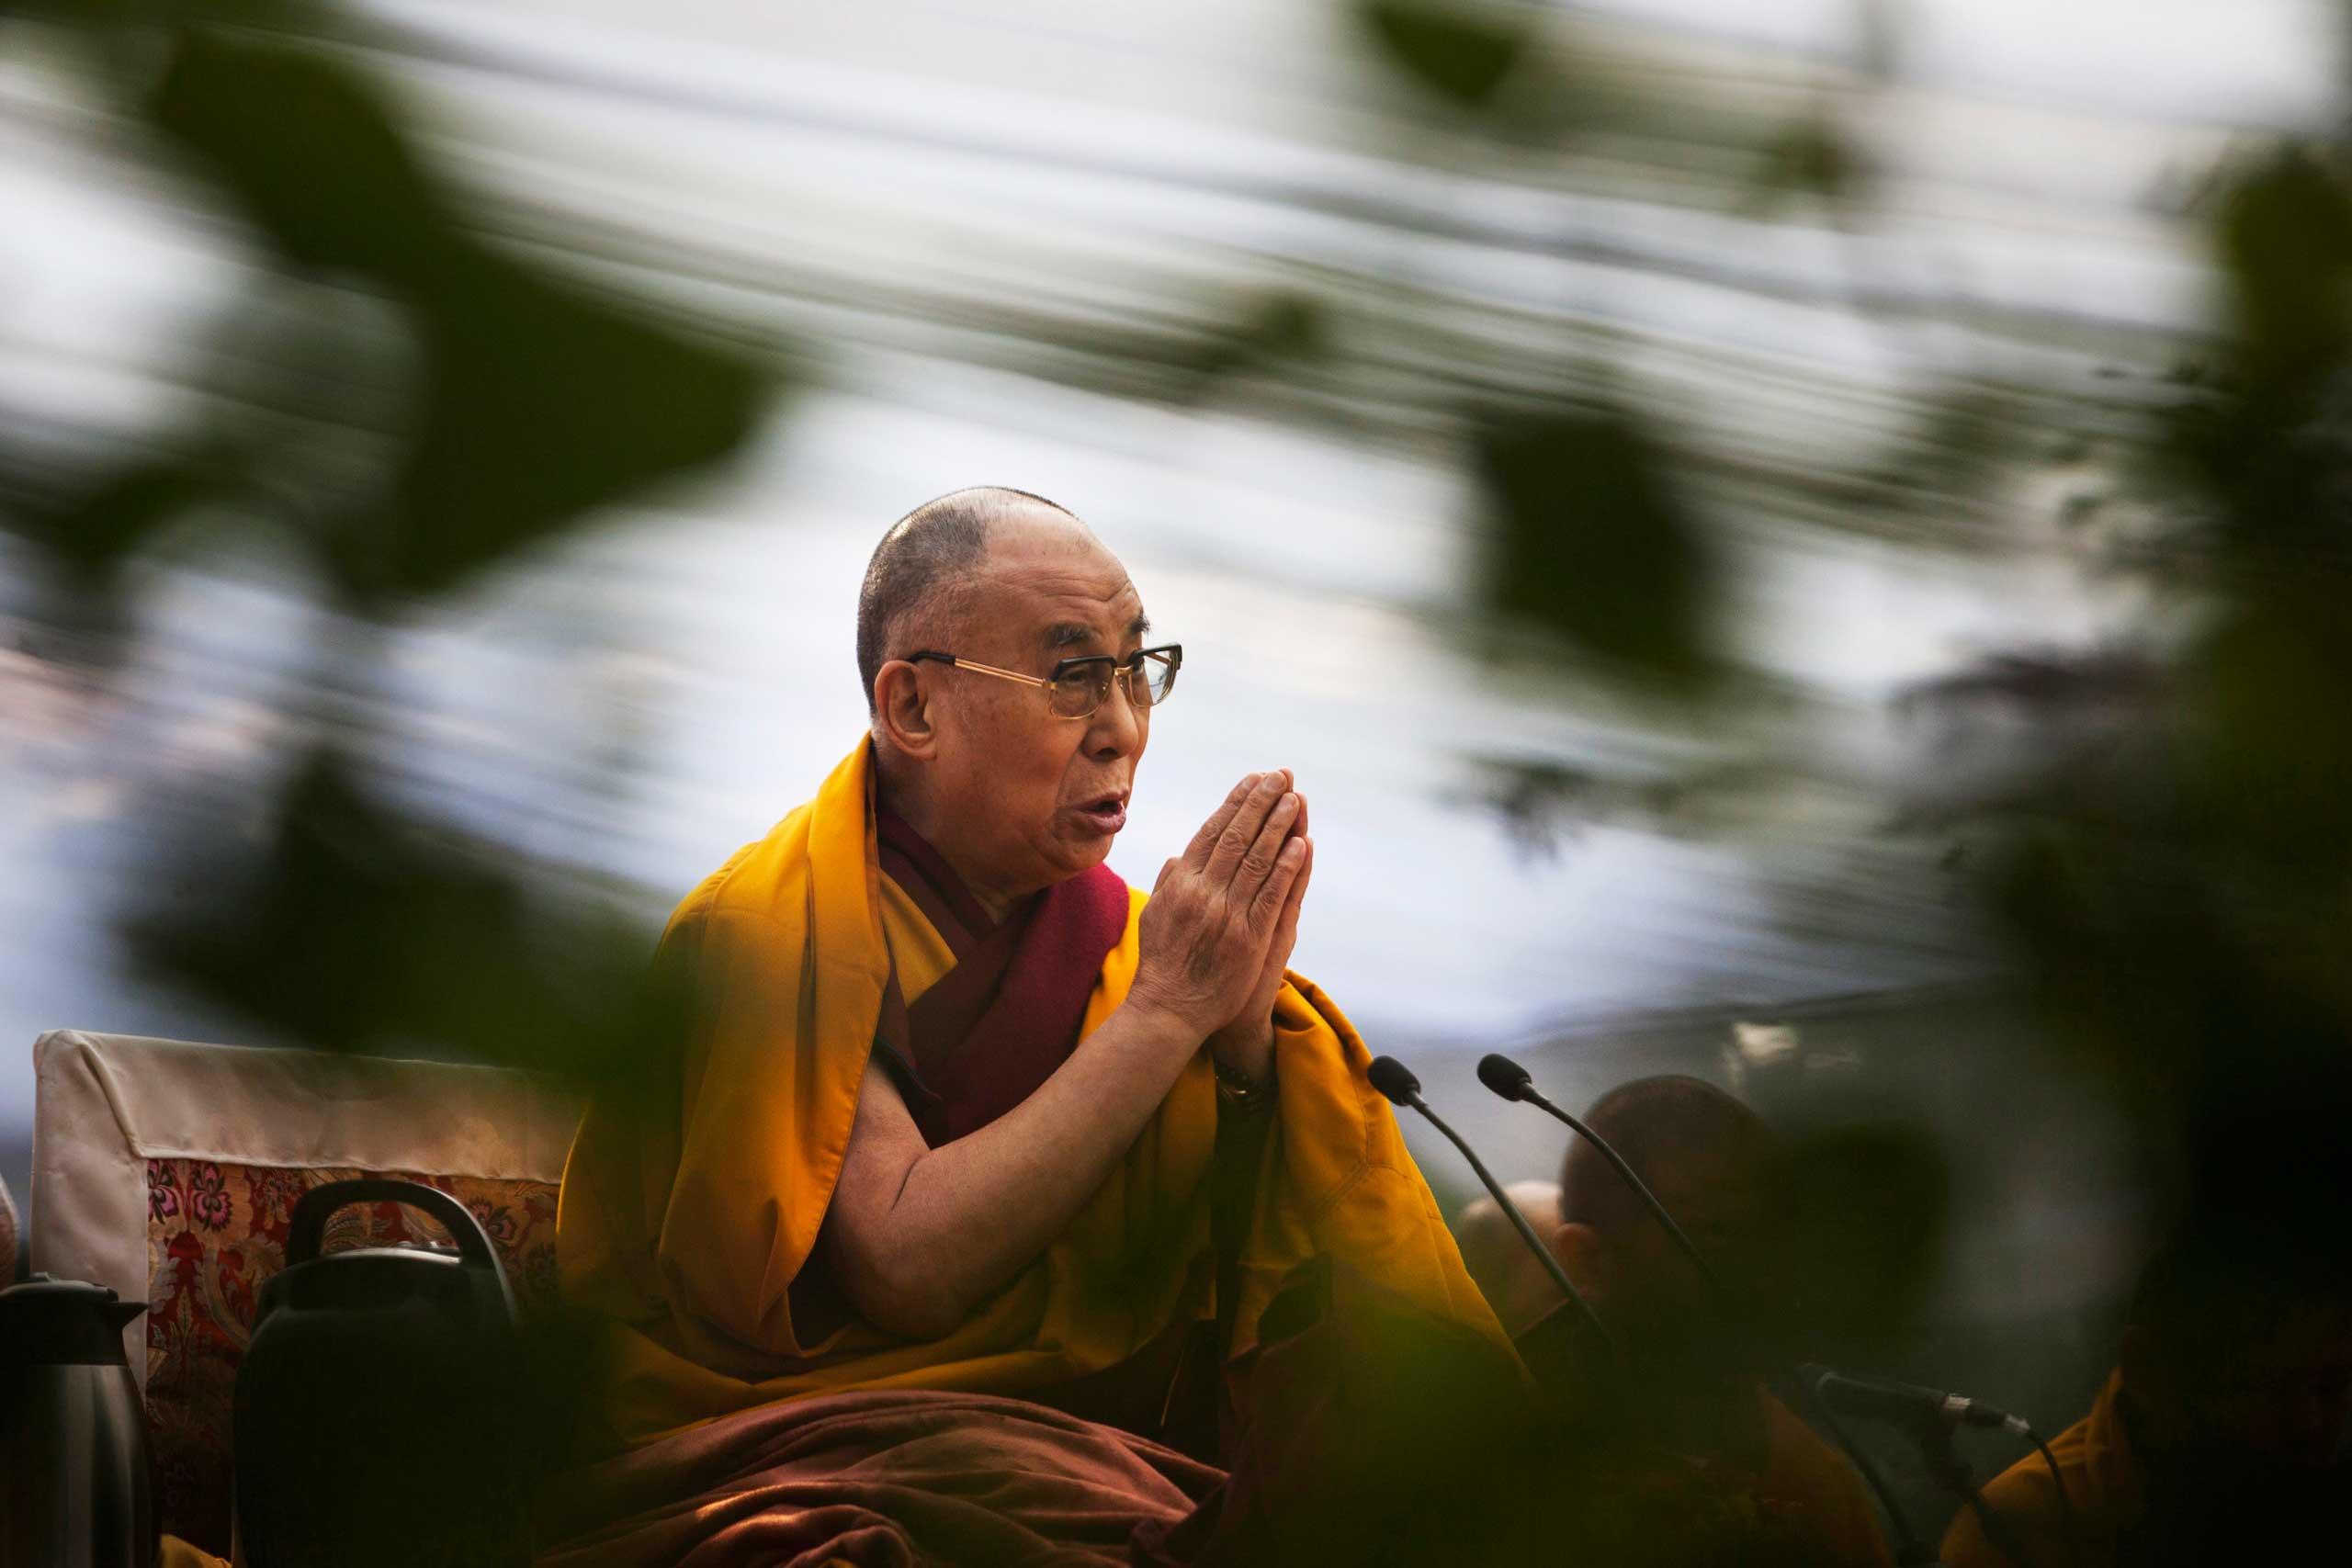 Tibetan spiritual leader the Dalai Lama prays during Ganden Ngachoe, the death anniversary of 14th Century Tibetan Saint-Scholar Lama Tsongkhapa, in New Delhi, India, Dec. 16, 2014.